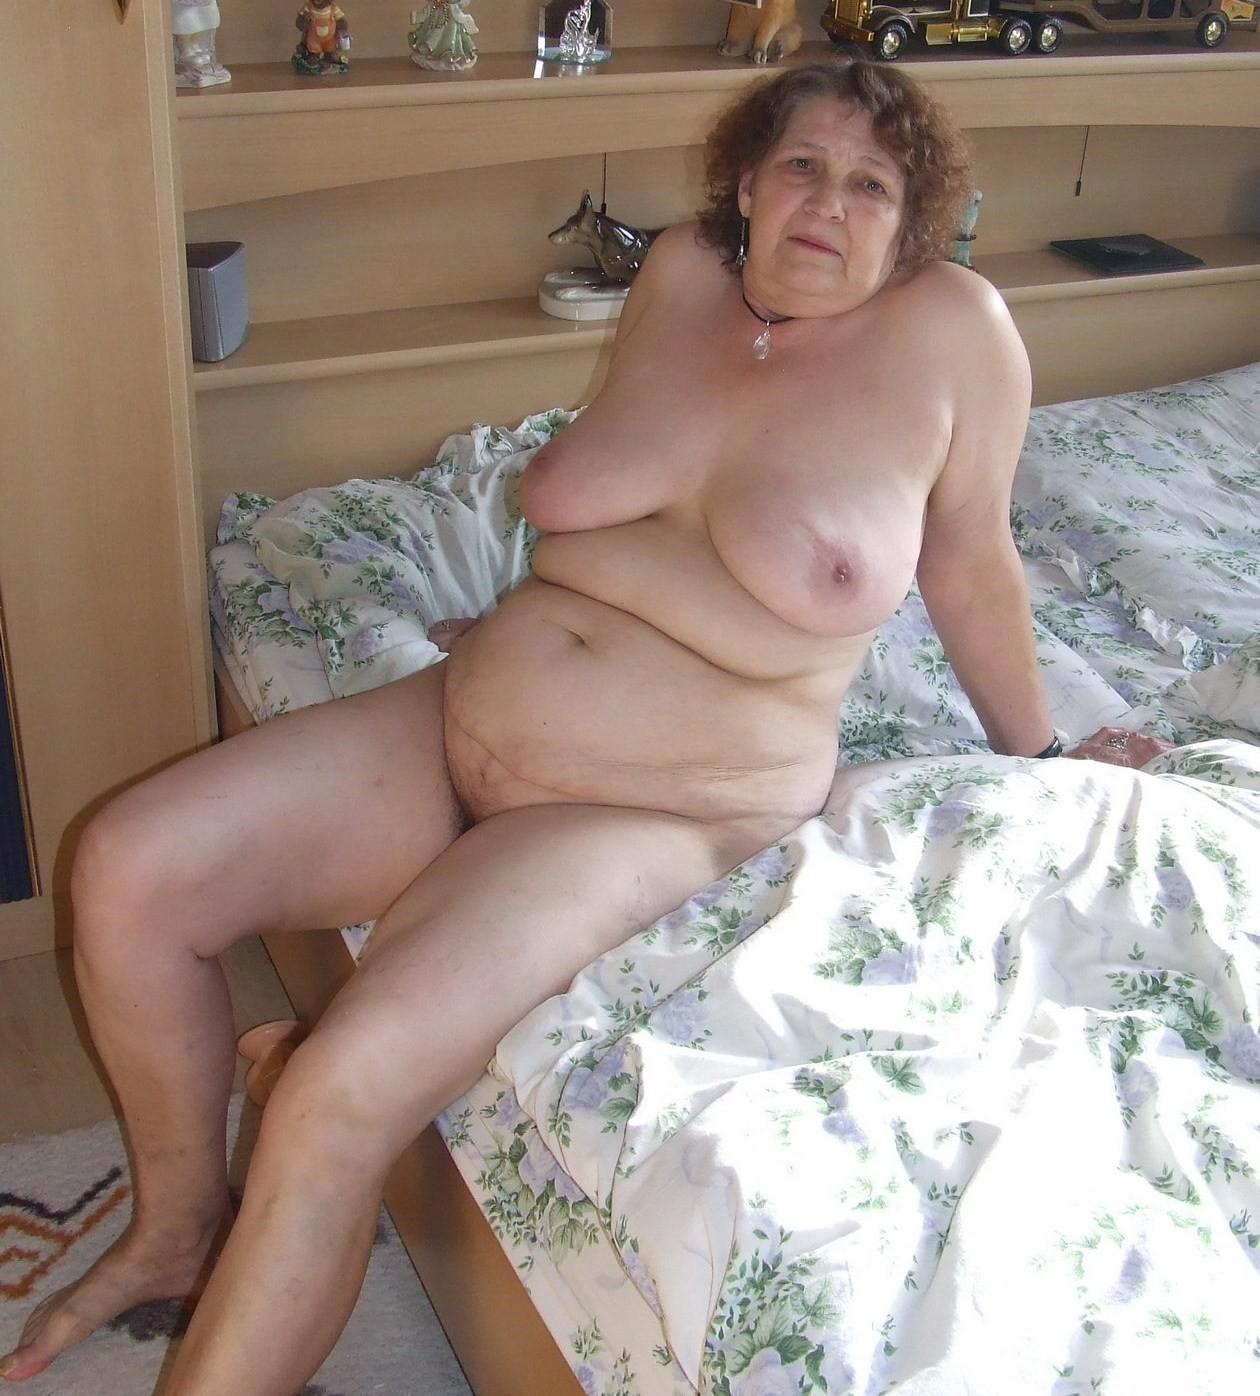 Dirty british girls naked